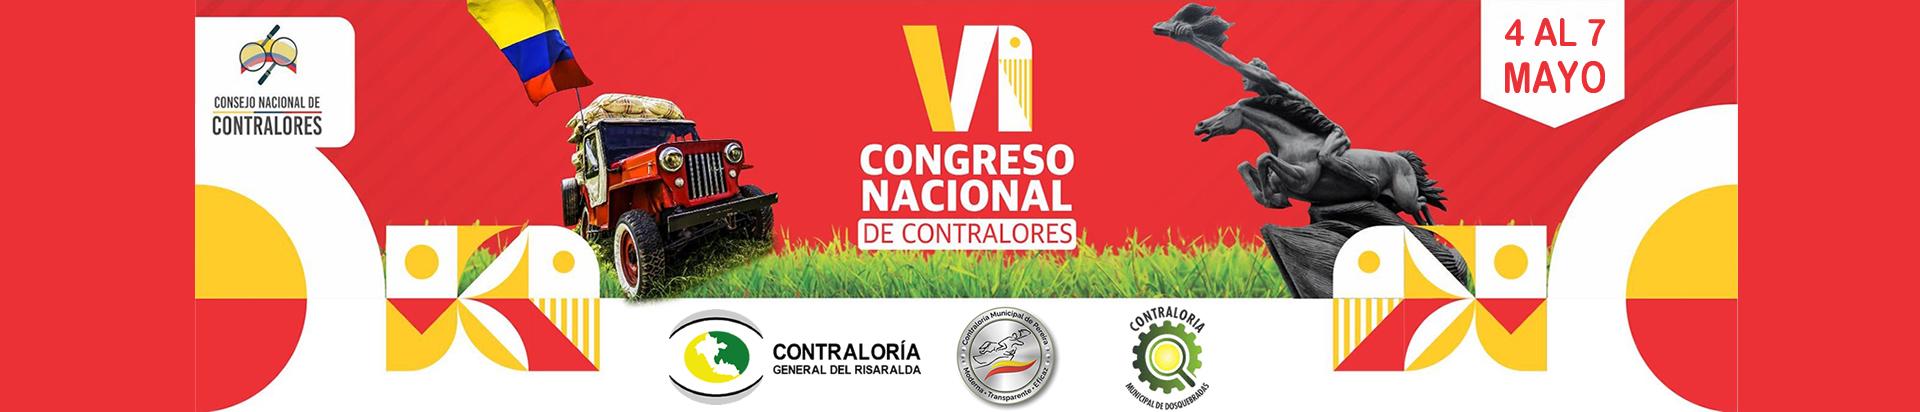 banner-congreso-v3